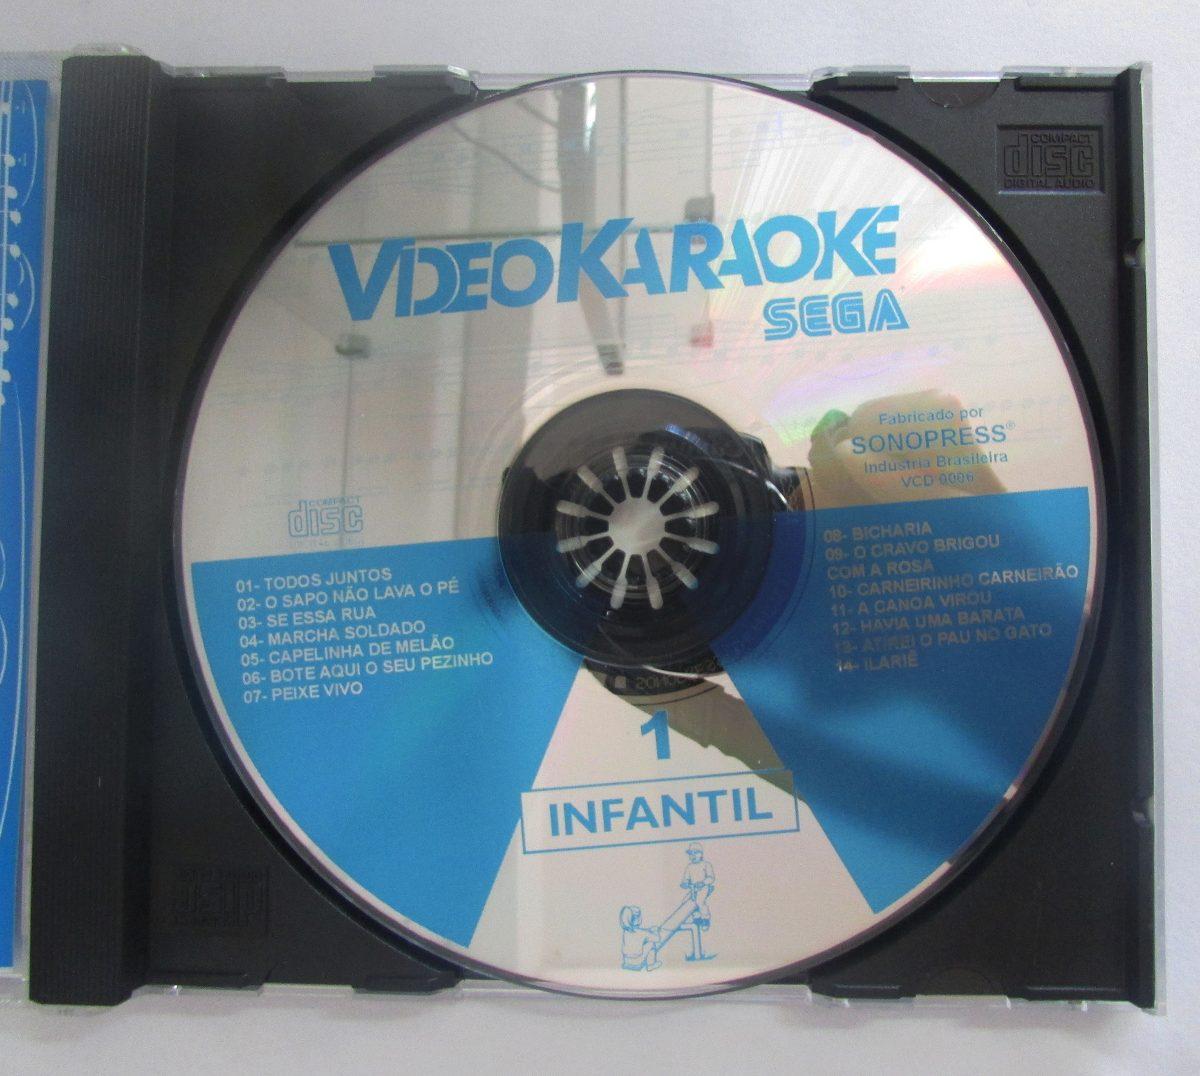 cddvd-de-videokaraoke-infantil-1-sega-se